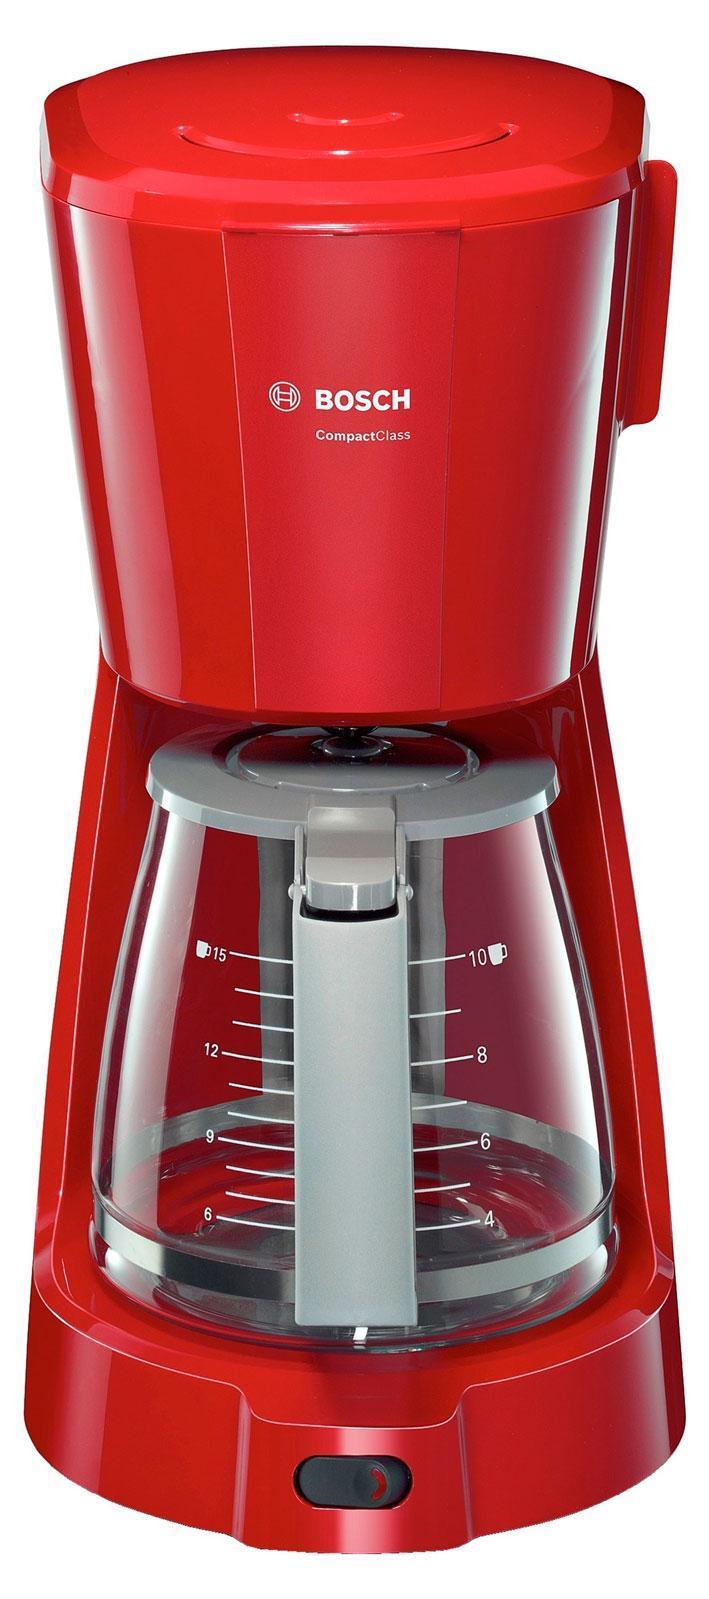 Bosch TKA 3A034 Compact Class, Red кофеварка